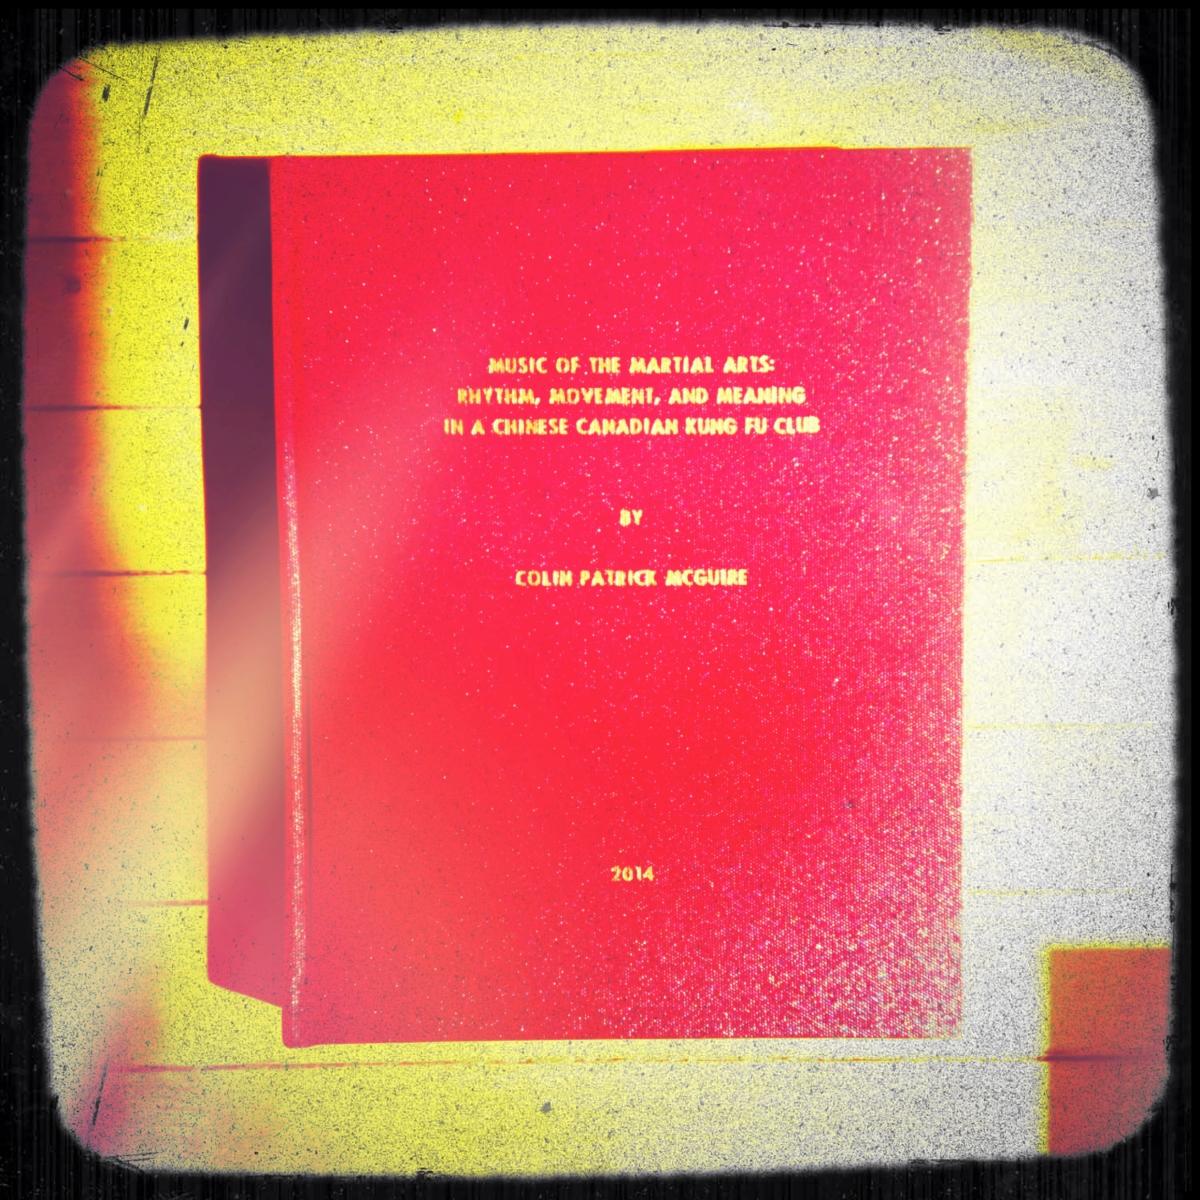 Phd thesis music